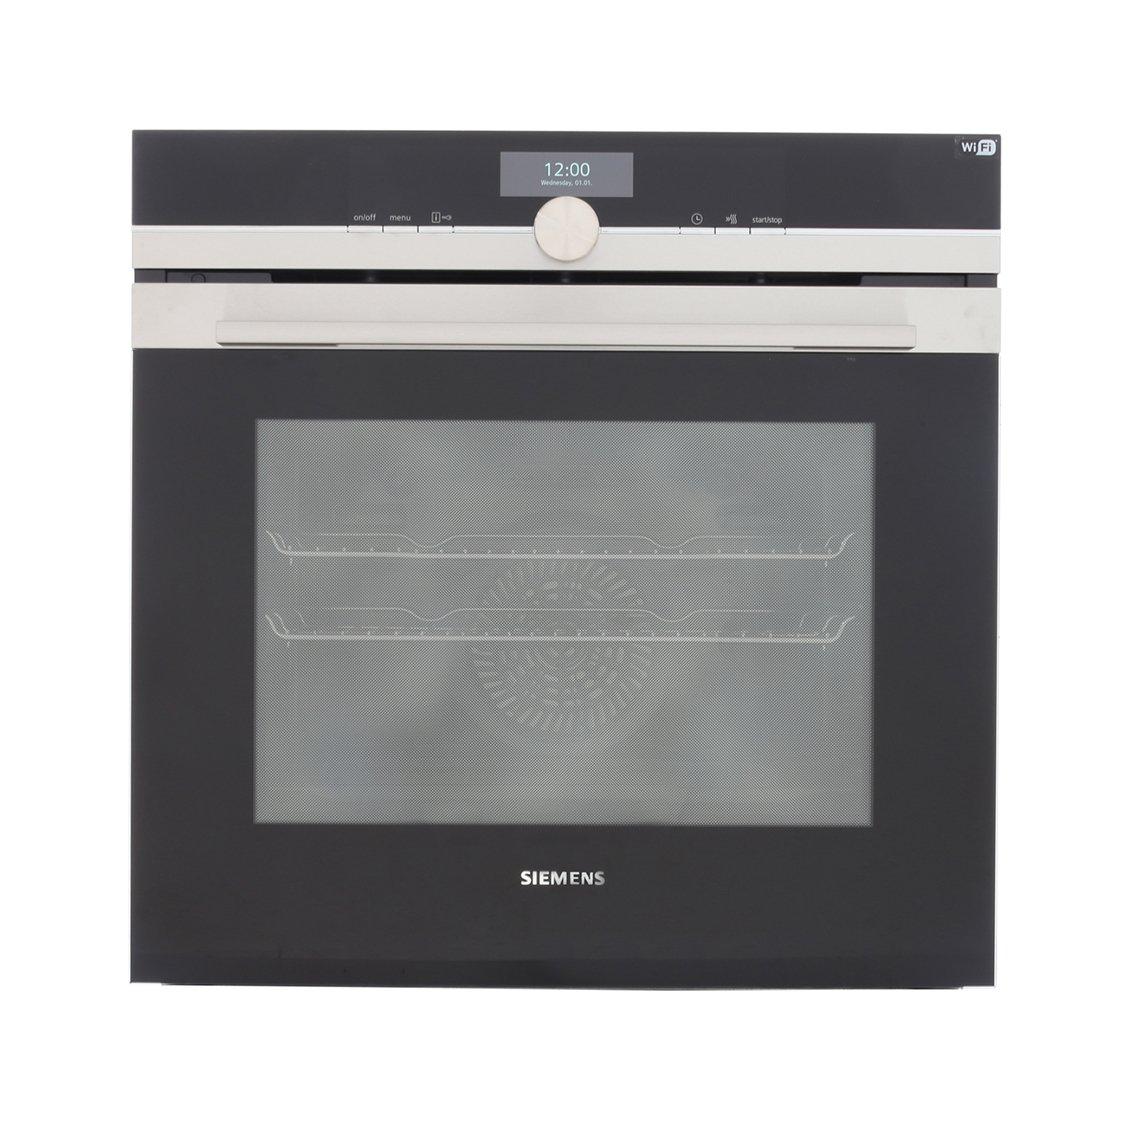 Buy siemens hb676gbs6b single built in electric oven for Siemens ofen